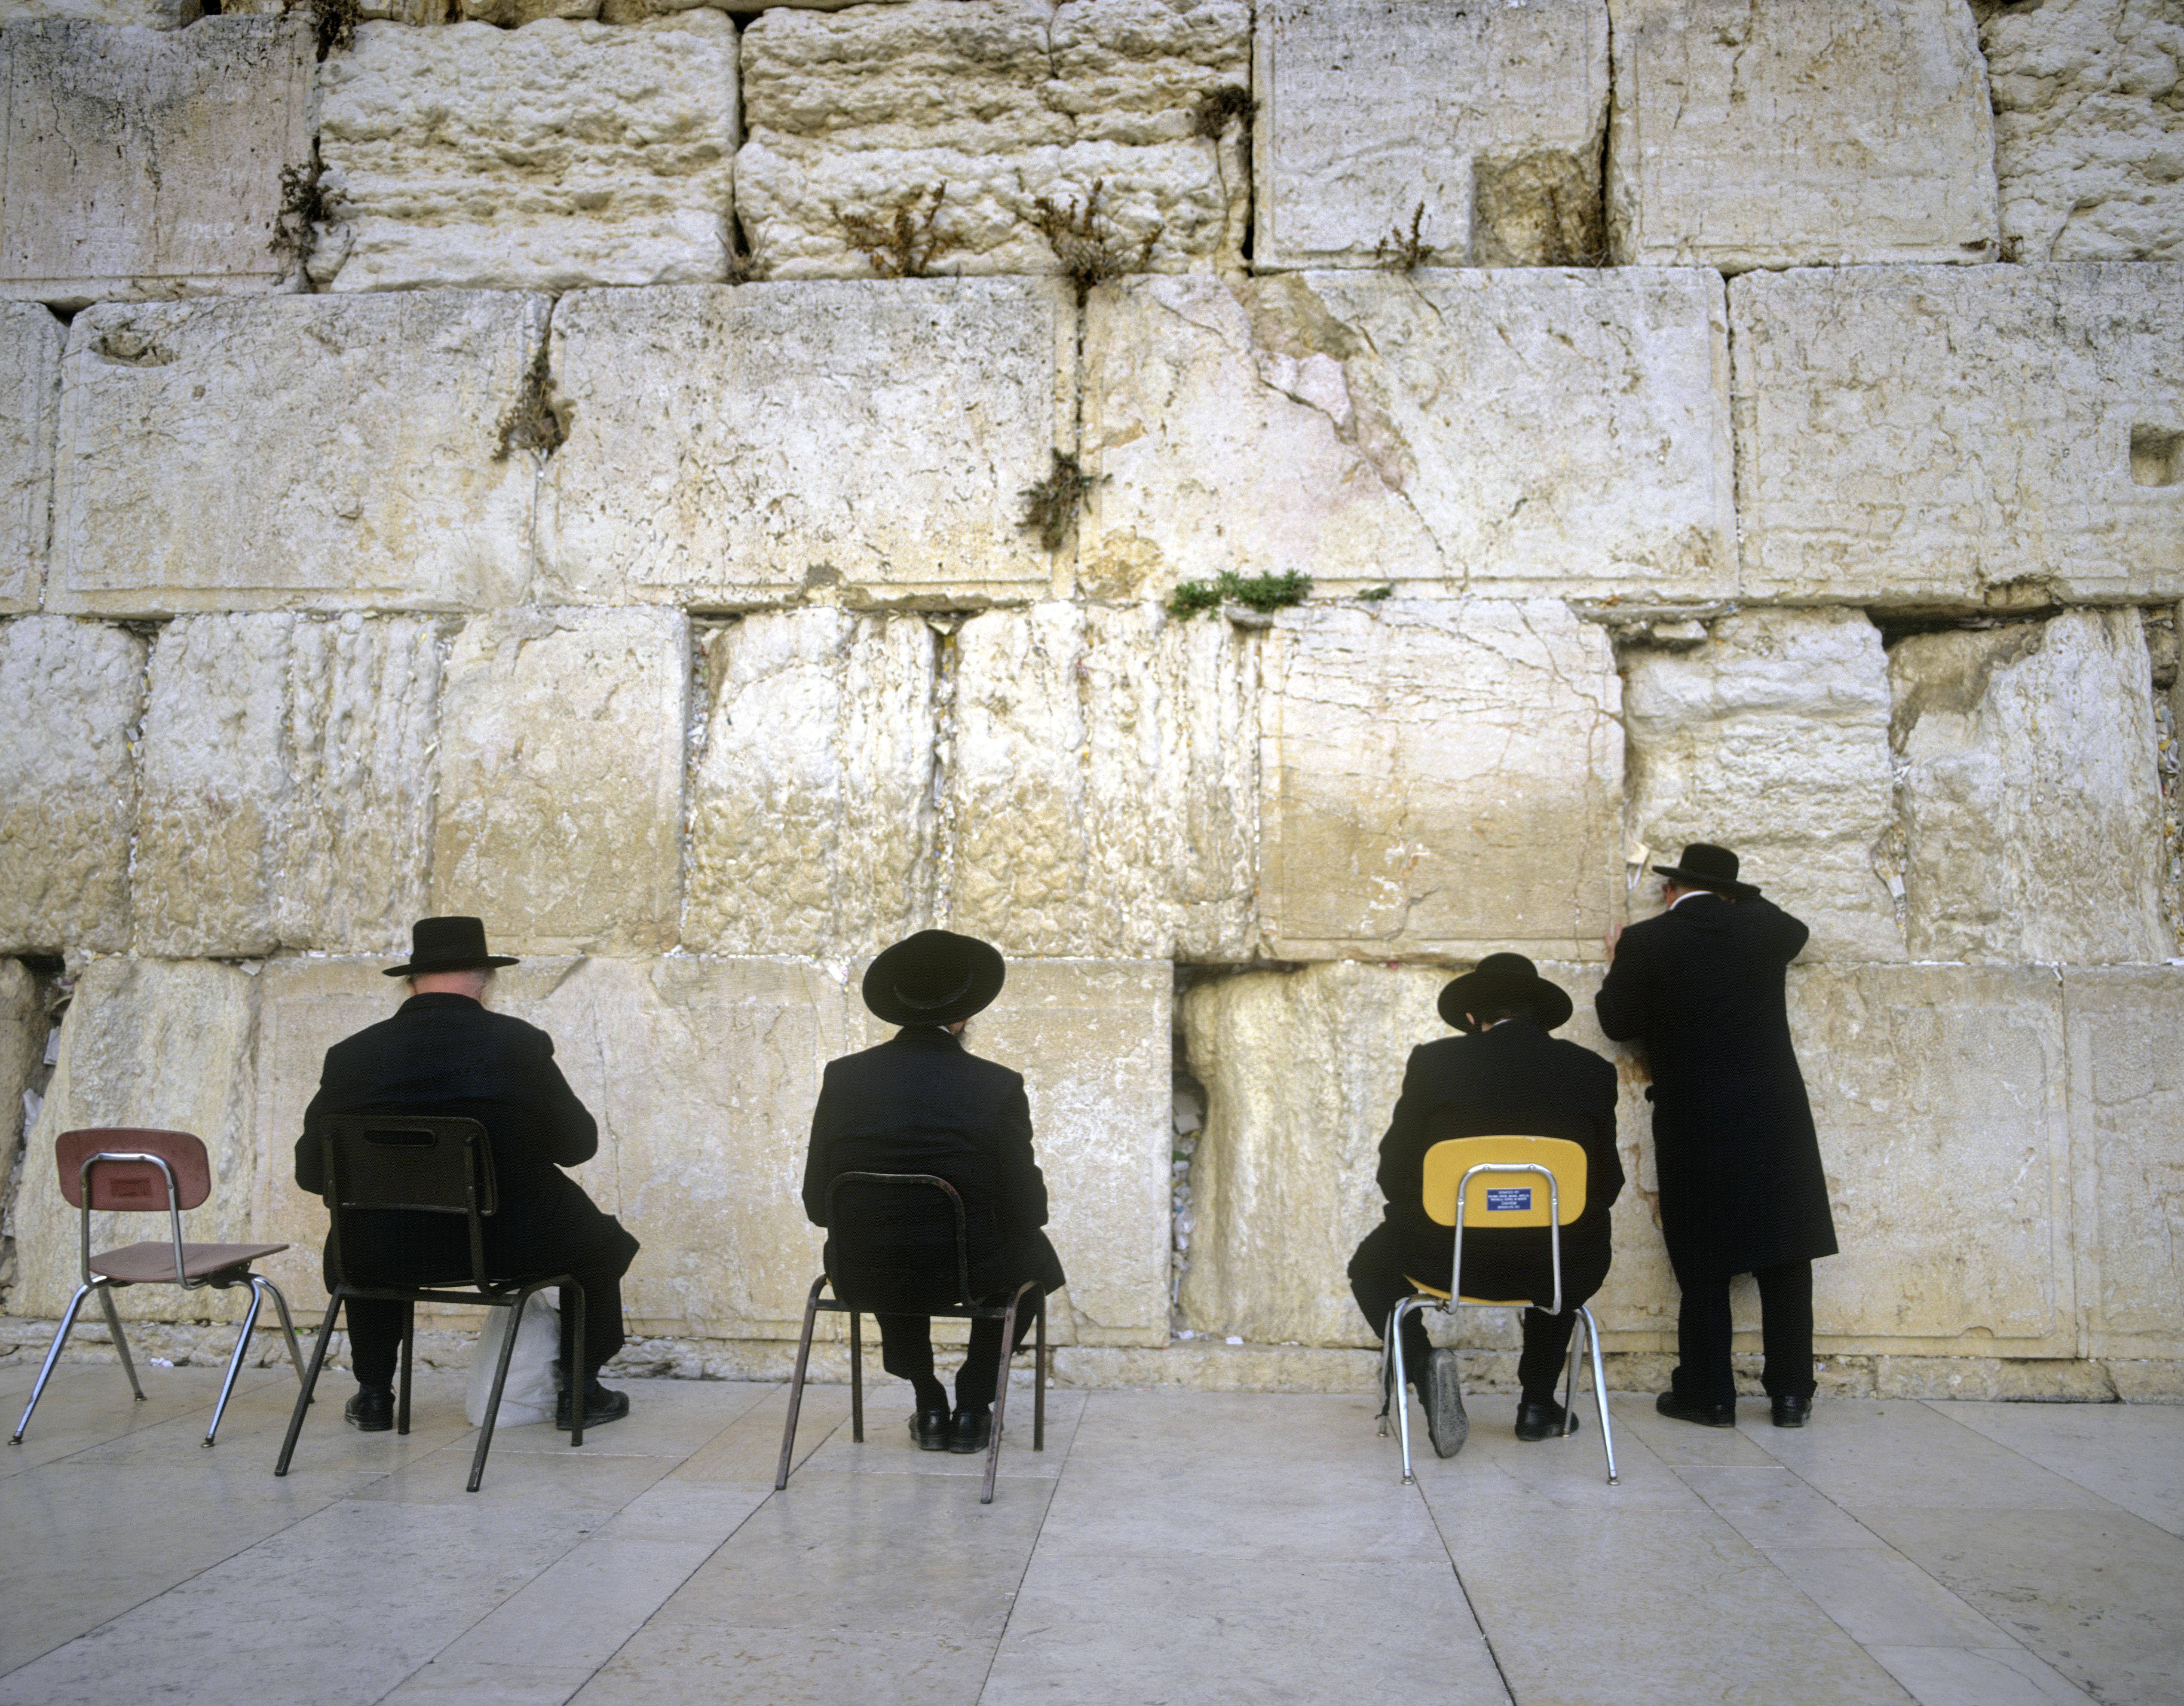 Sfeerimpressie Rondreis Israël